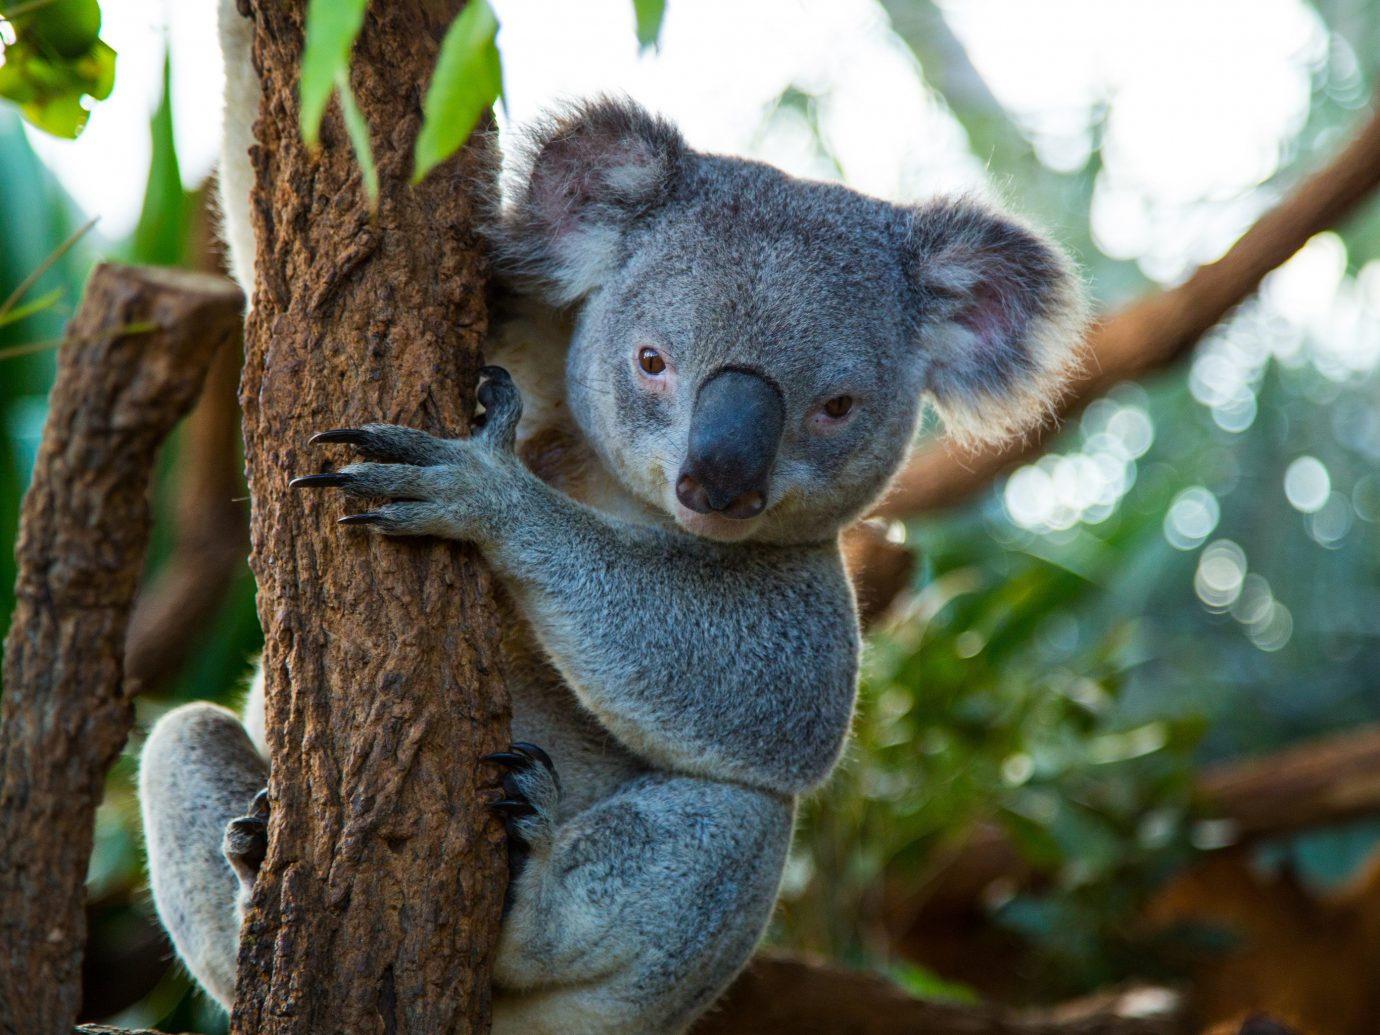 Trip Ideas tree koala animal mammal outdoor vertebrate Wildlife marsupial fauna branch zoo wood